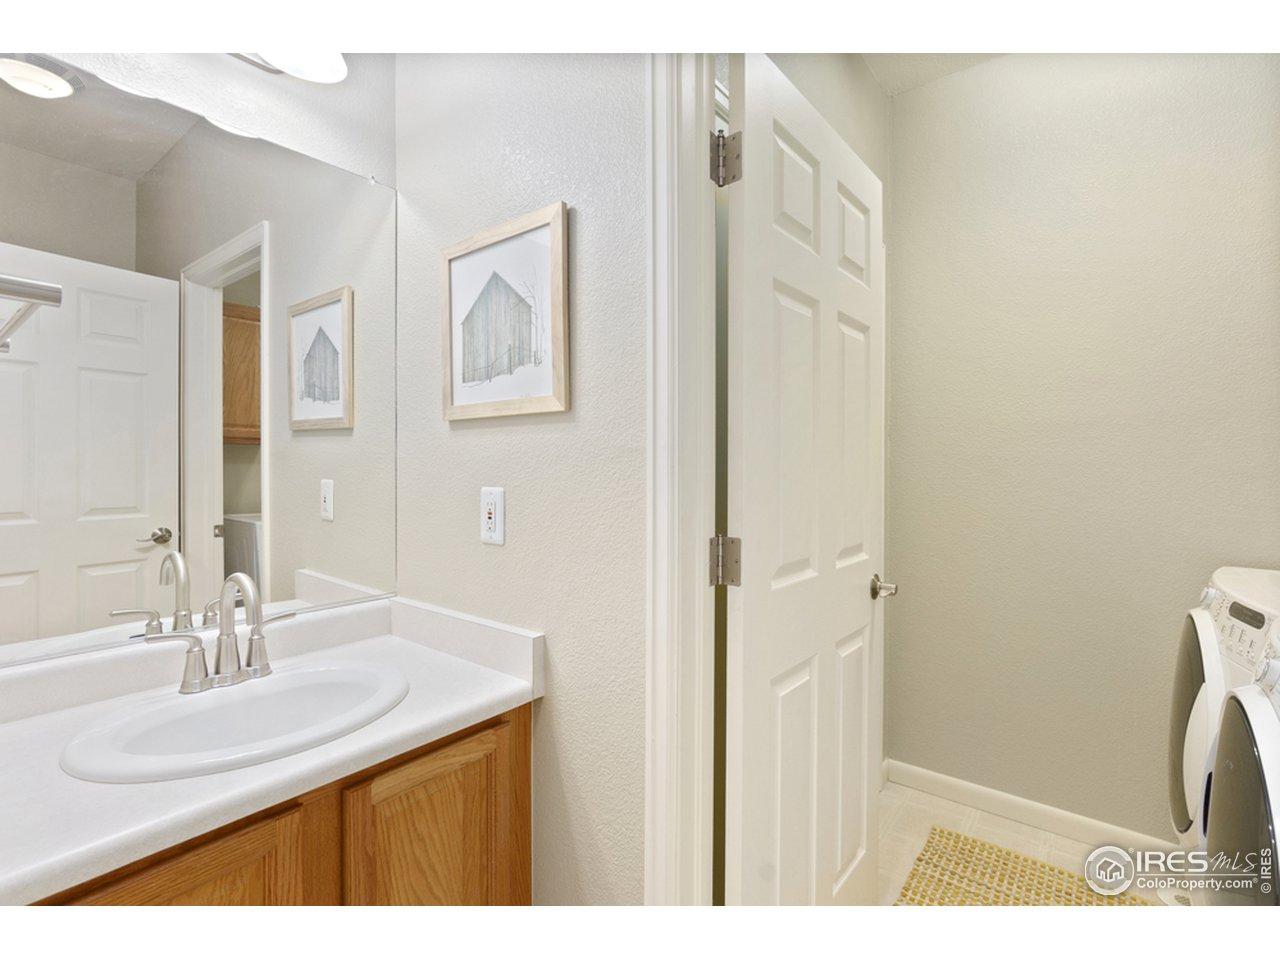 Powder bathroom and laundry